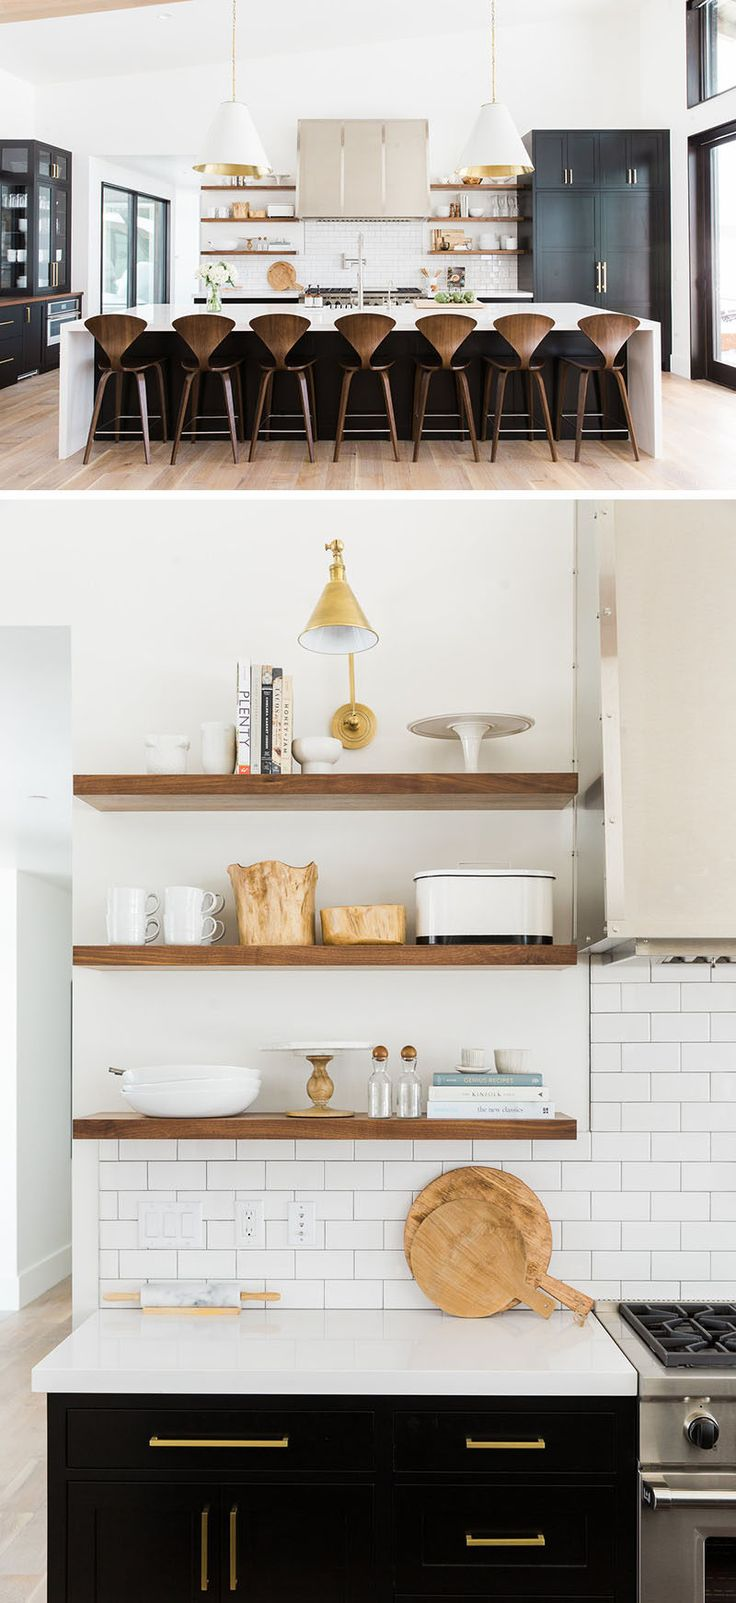 Best 25+ Open shelving ideas on Pinterest